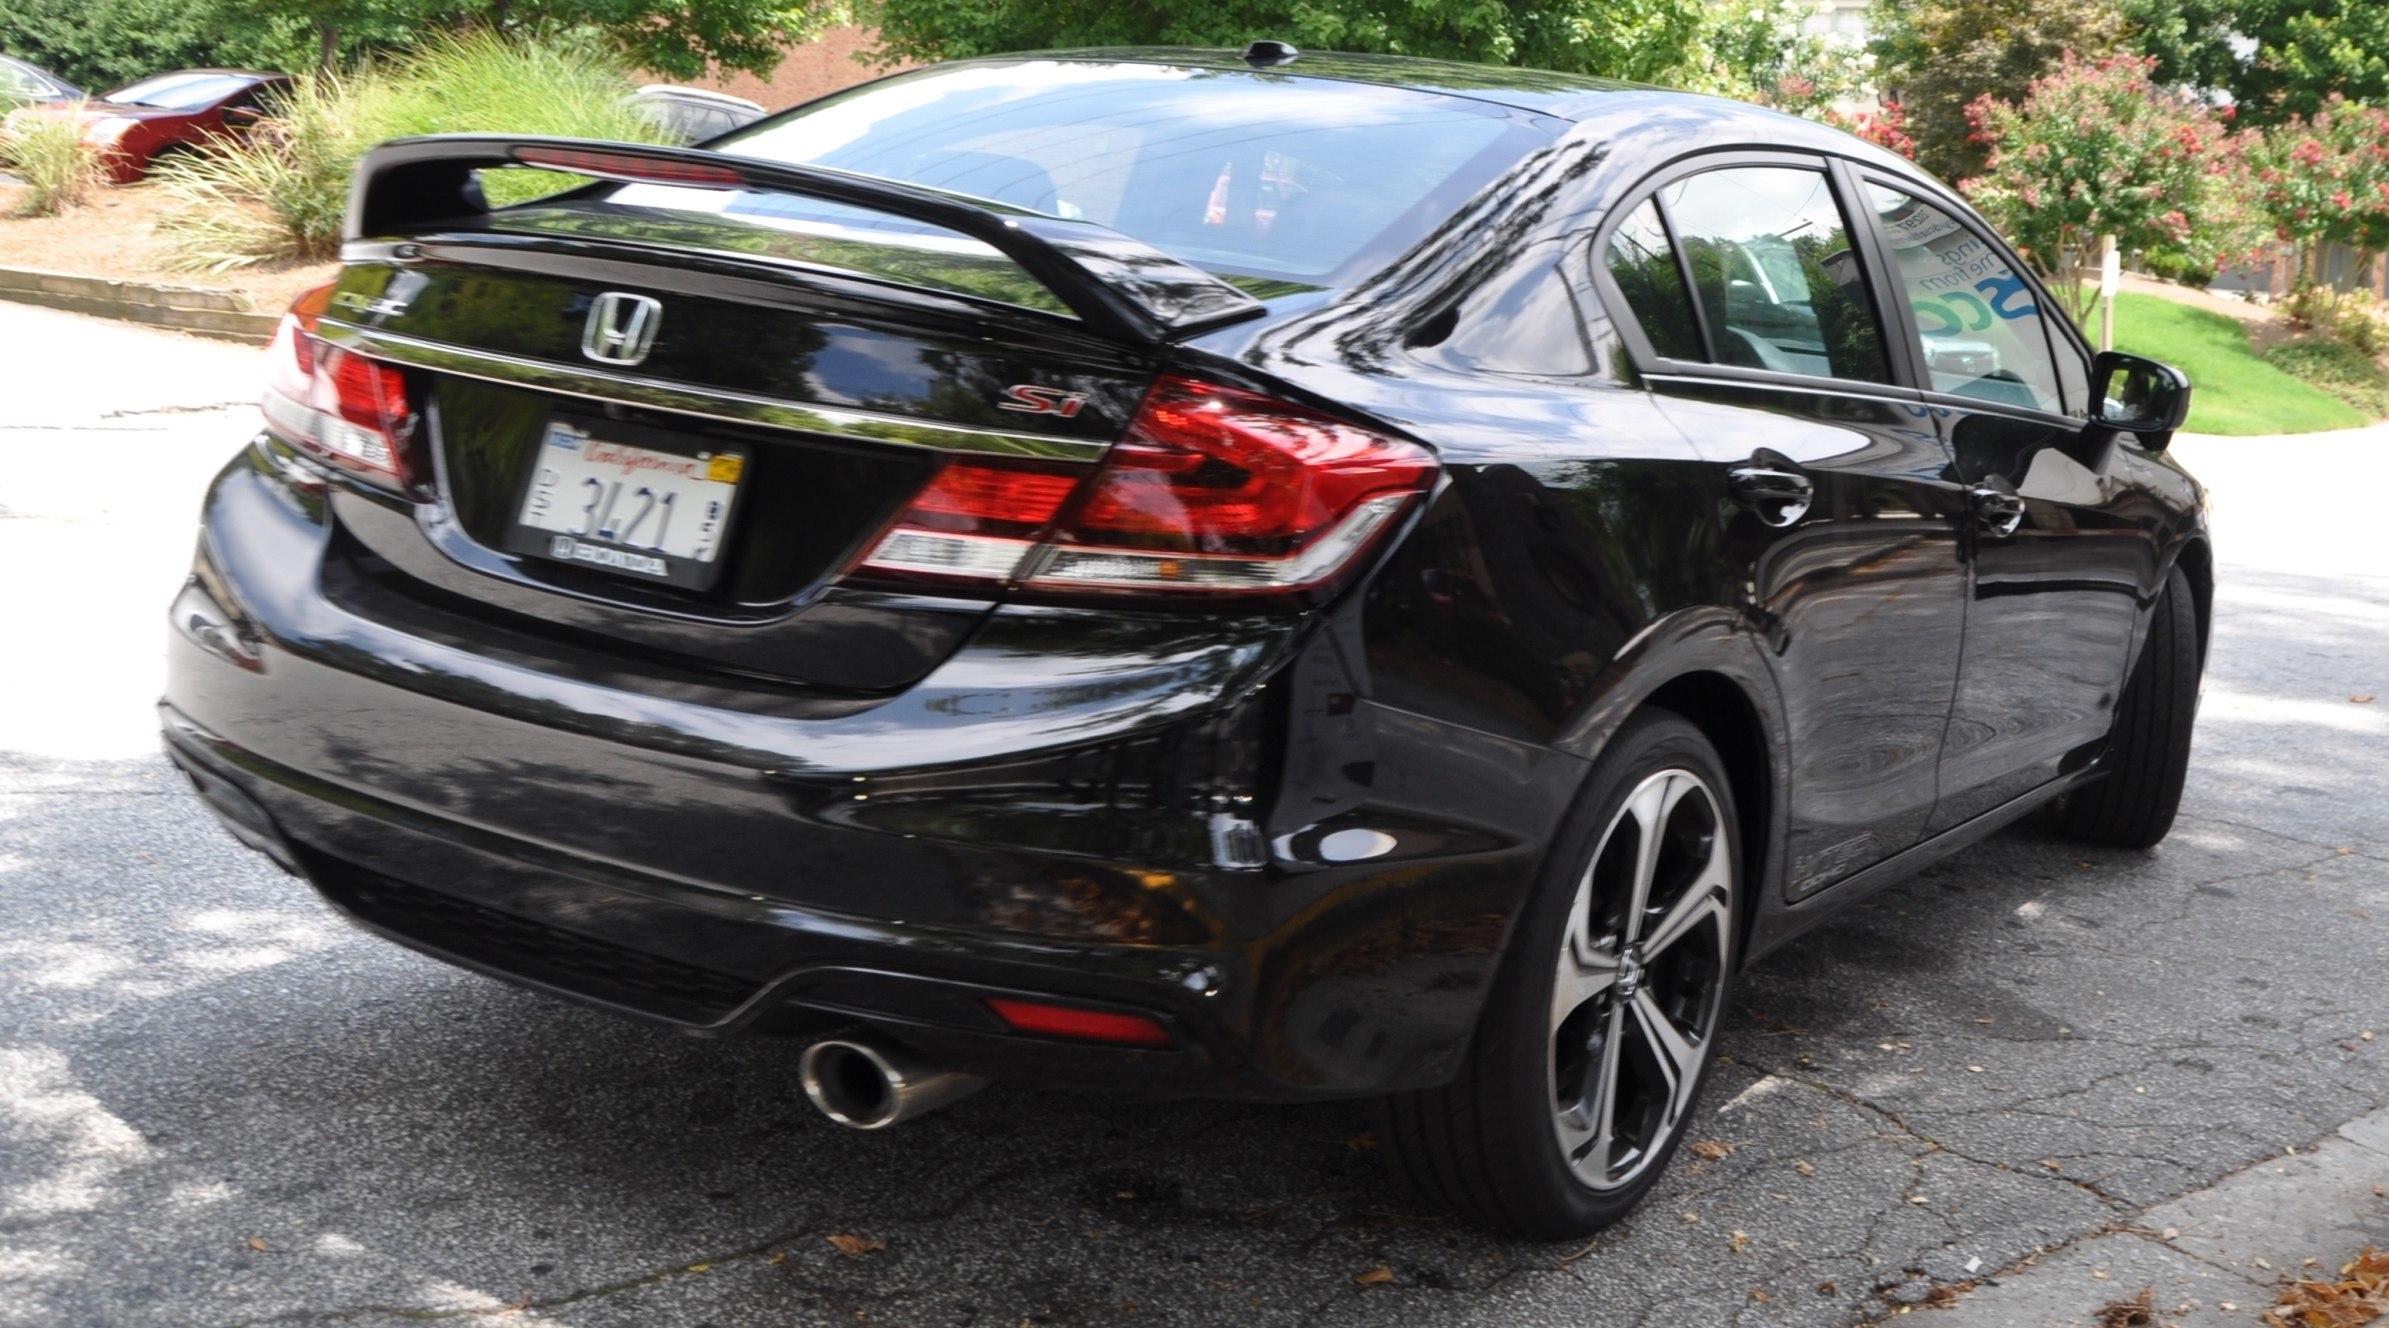 2014 Honda Civic Si Sedan Looking Fu Cool In 32 Real Life Photos 25